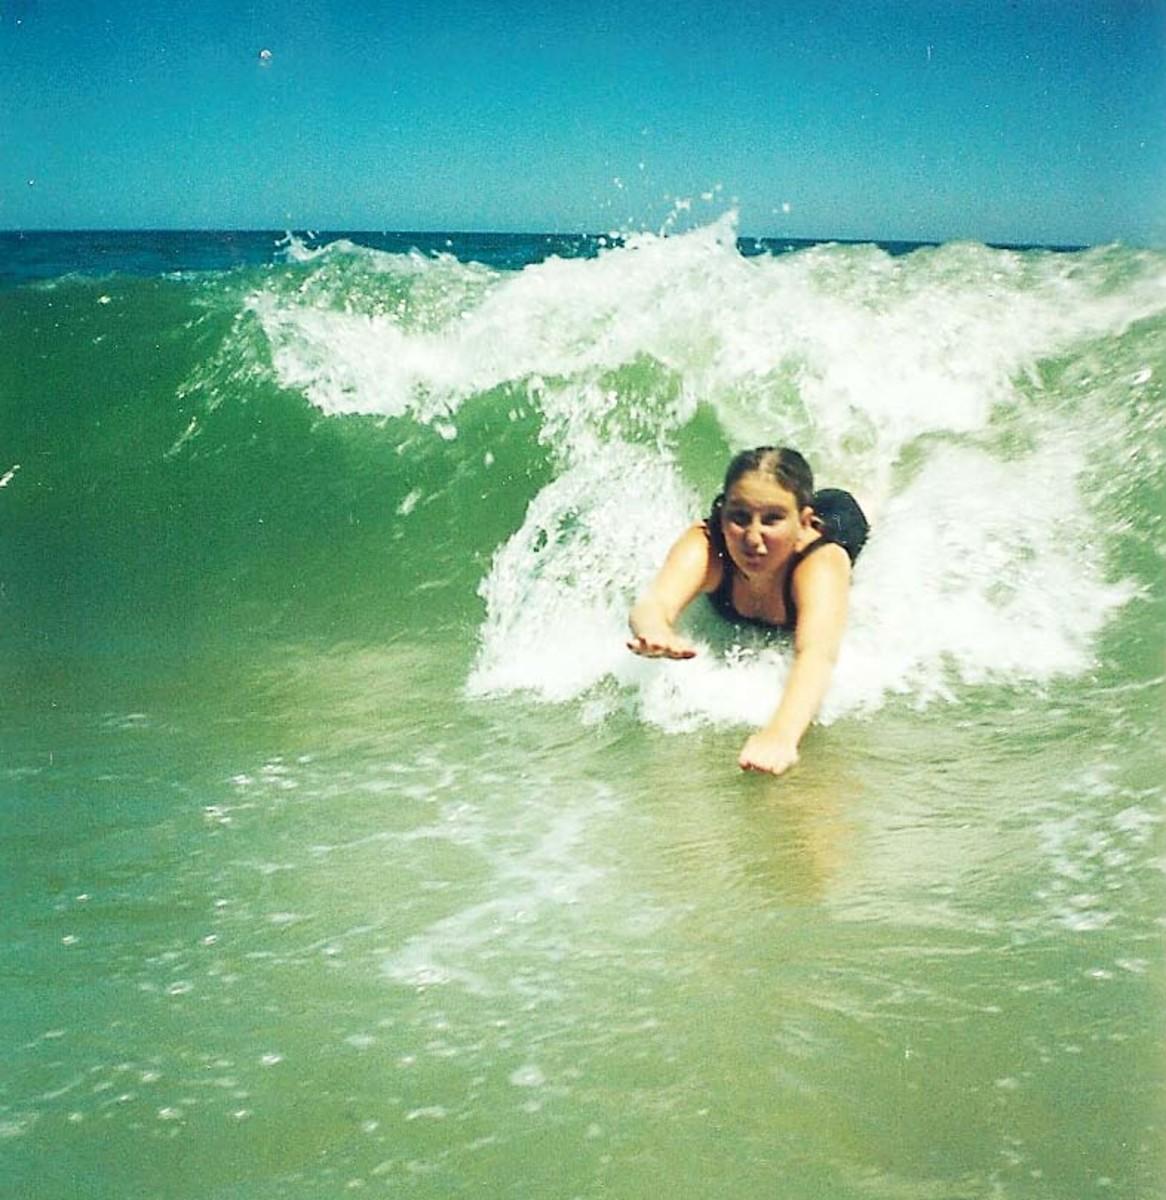 Bodysurfing - Girl in Ocean City, Maryland (phot0 by Dolores Monet)